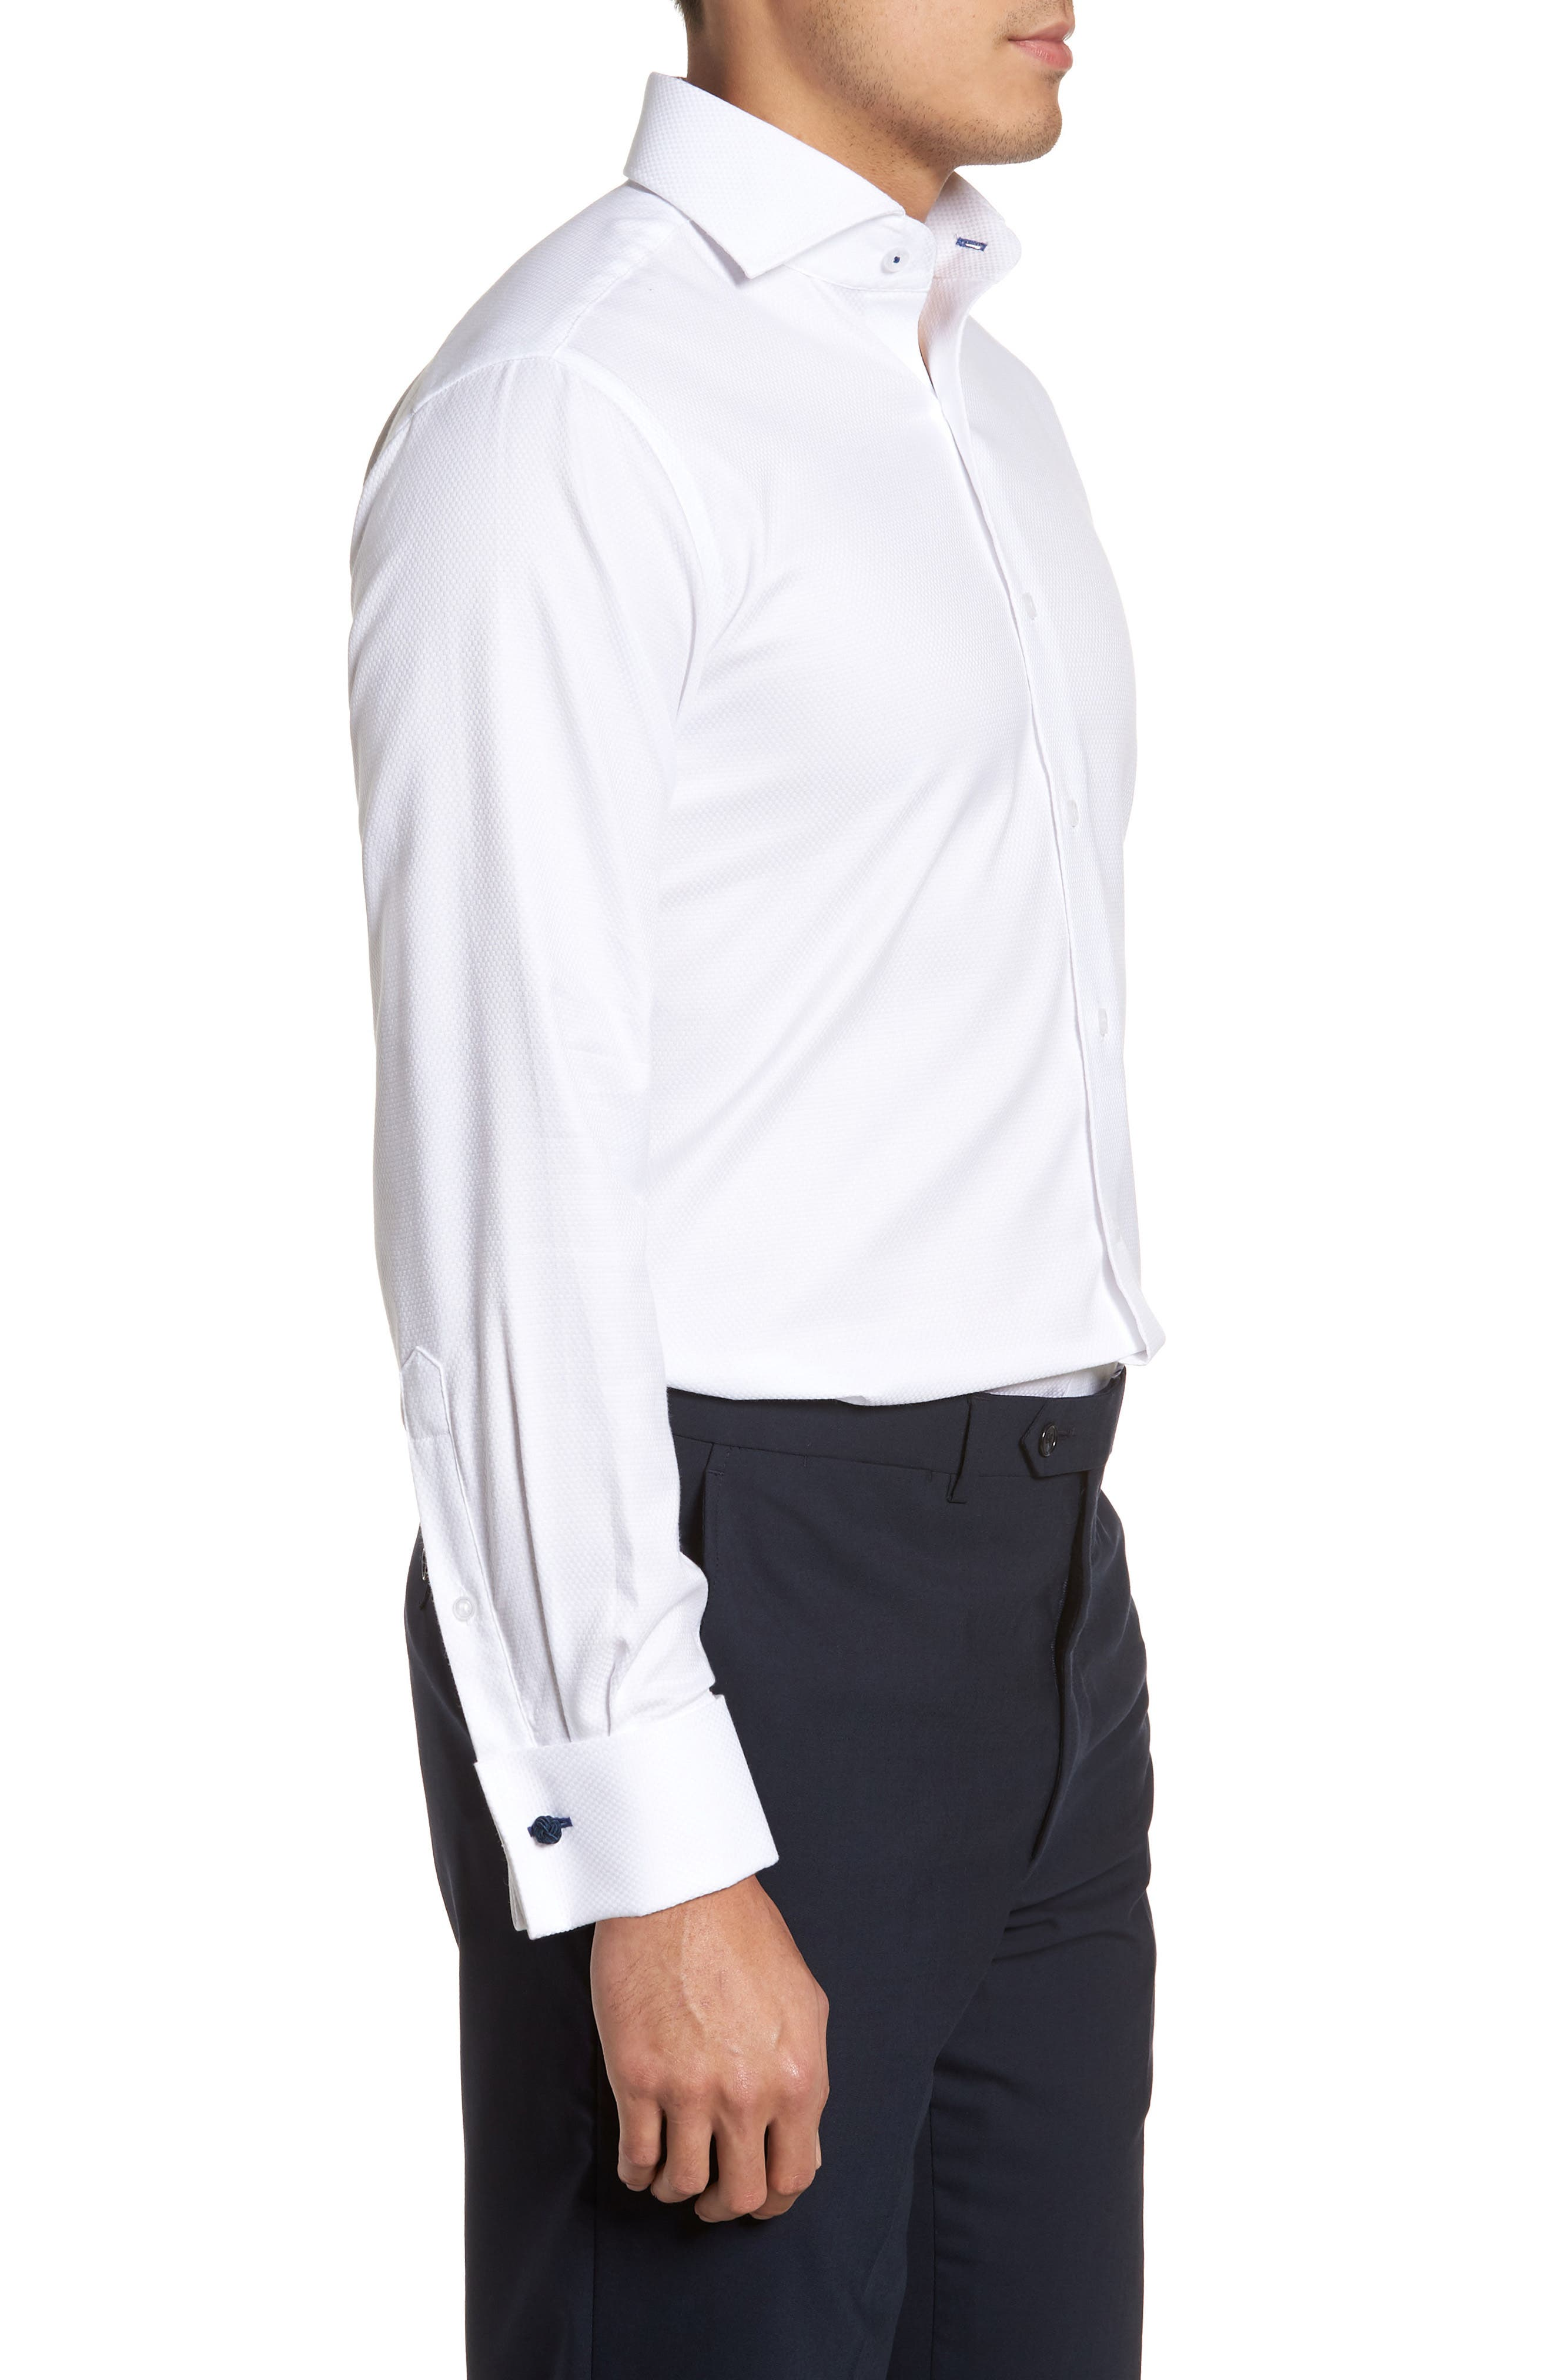 LORENZO UOMO, Trim Fit Basket Weave Dress Shirt, Alternate thumbnail 4, color, WHITE